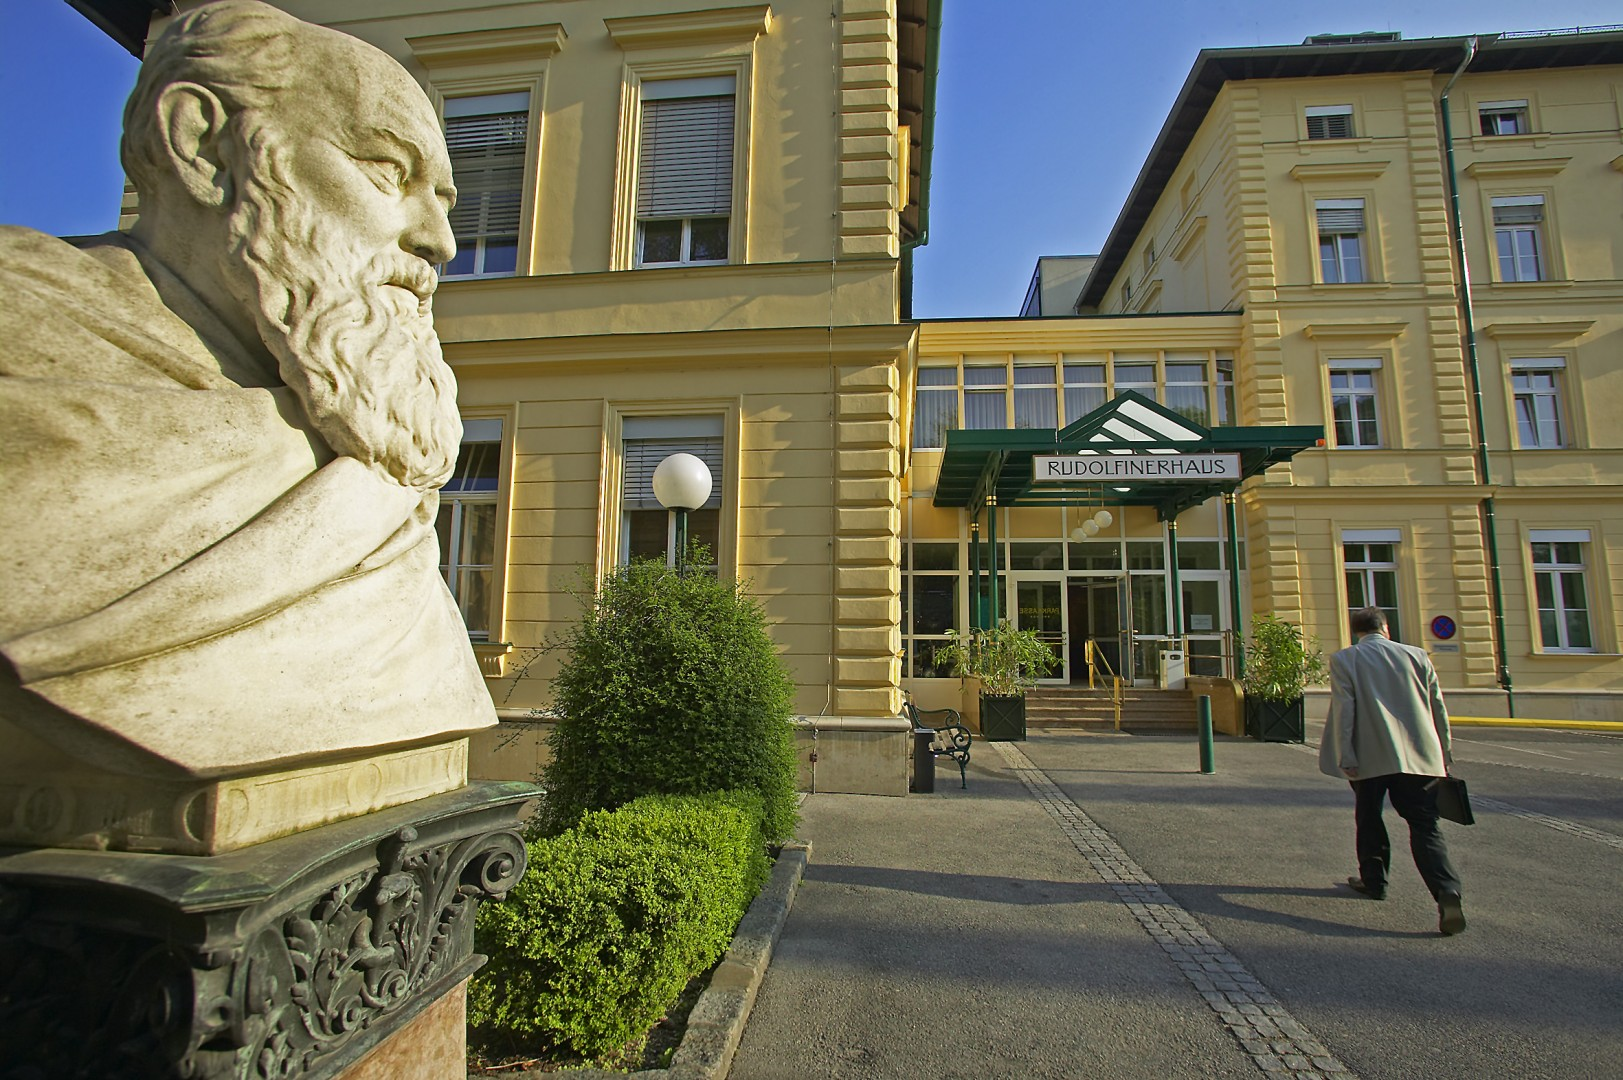 Rudolfinerhaus Billroth